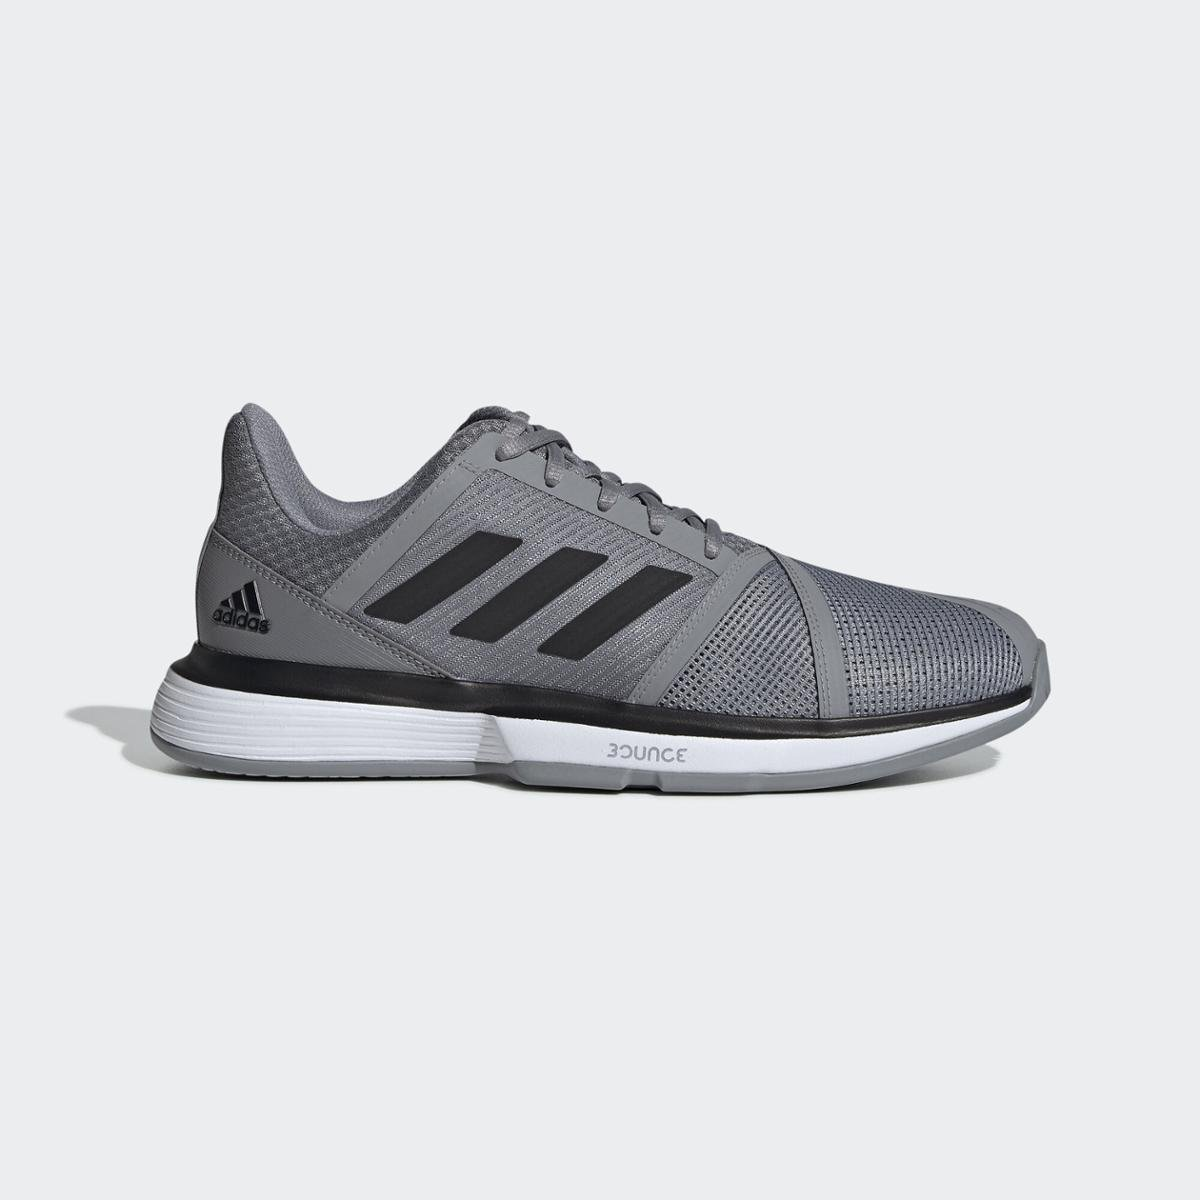 Tênis Courtjam Bounce Adidas - Cinza  - PROTENISTA